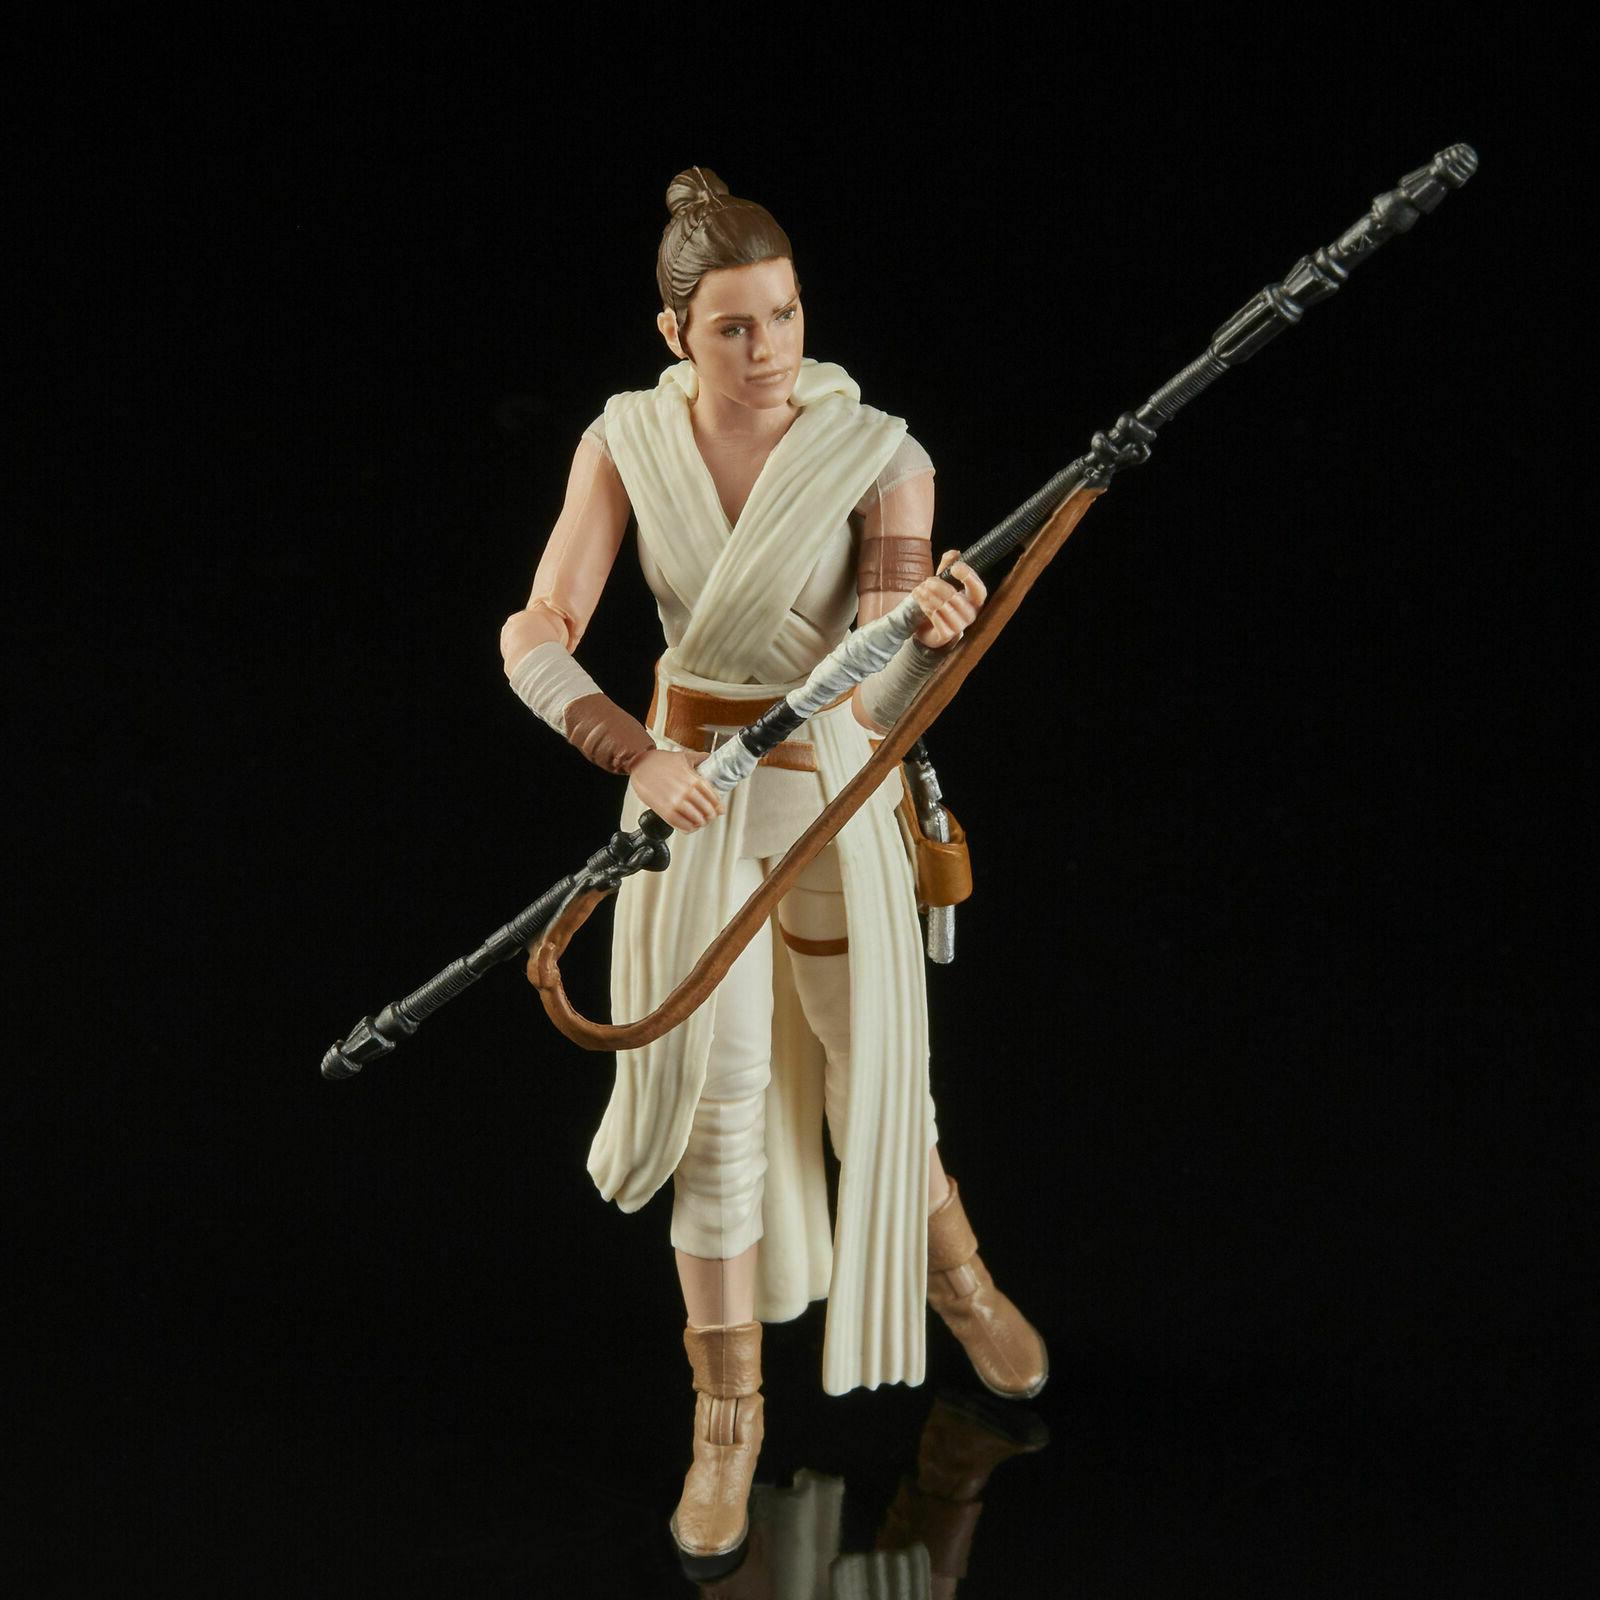 Star Wars Collection: of Skywalker Figure